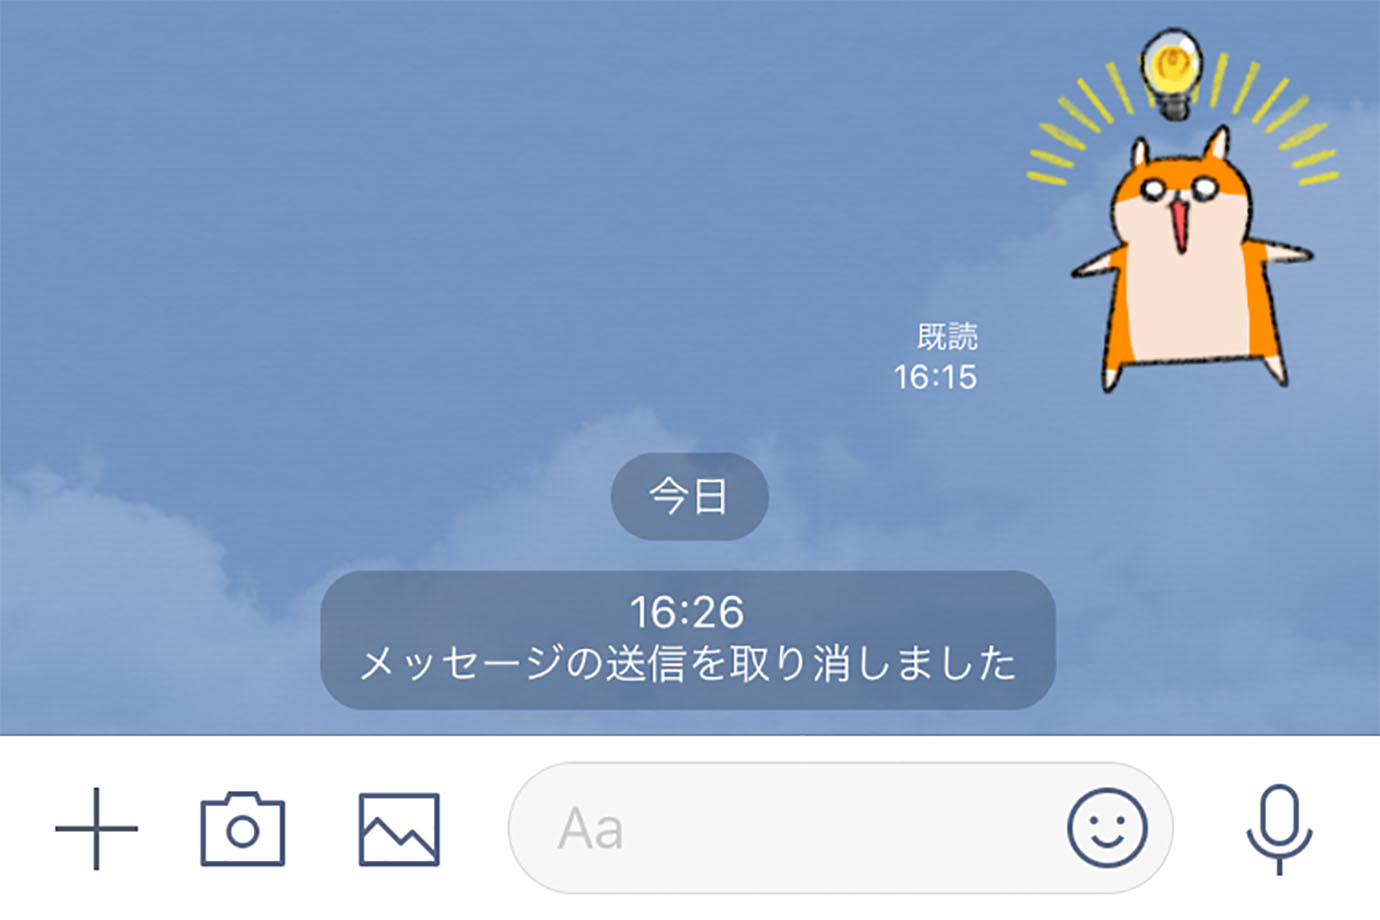 line-image2